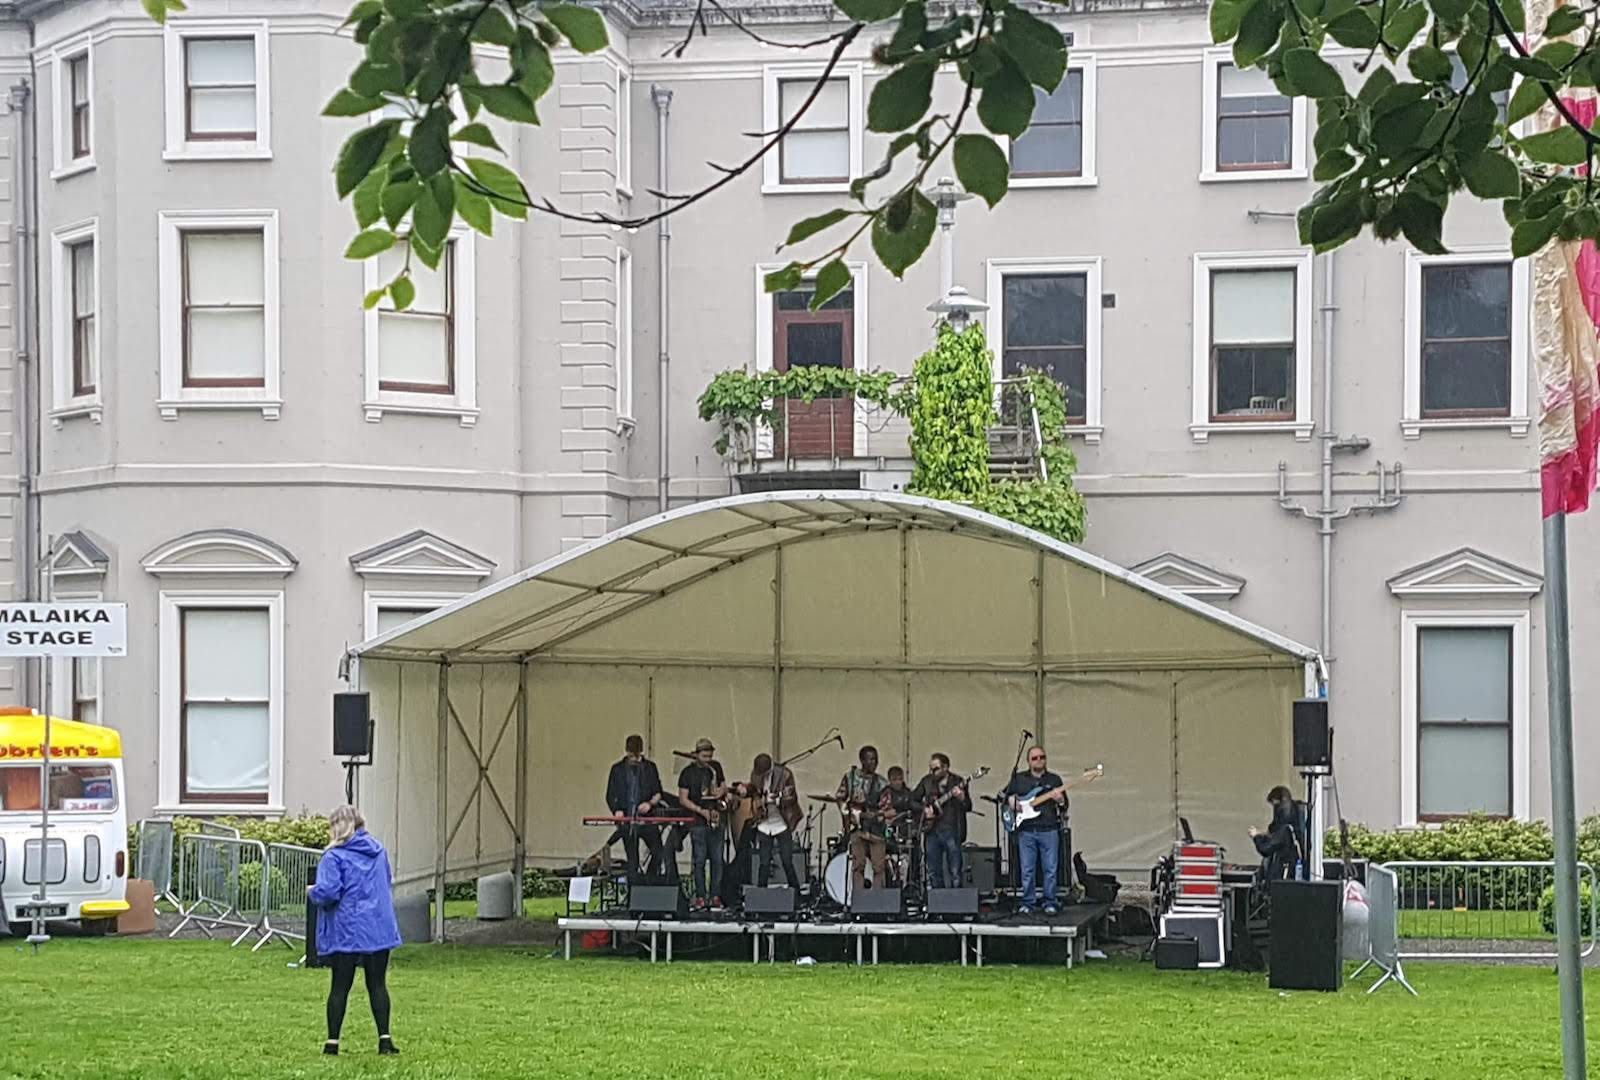 Africa Day 2018 - Phoenix Park, Dublin